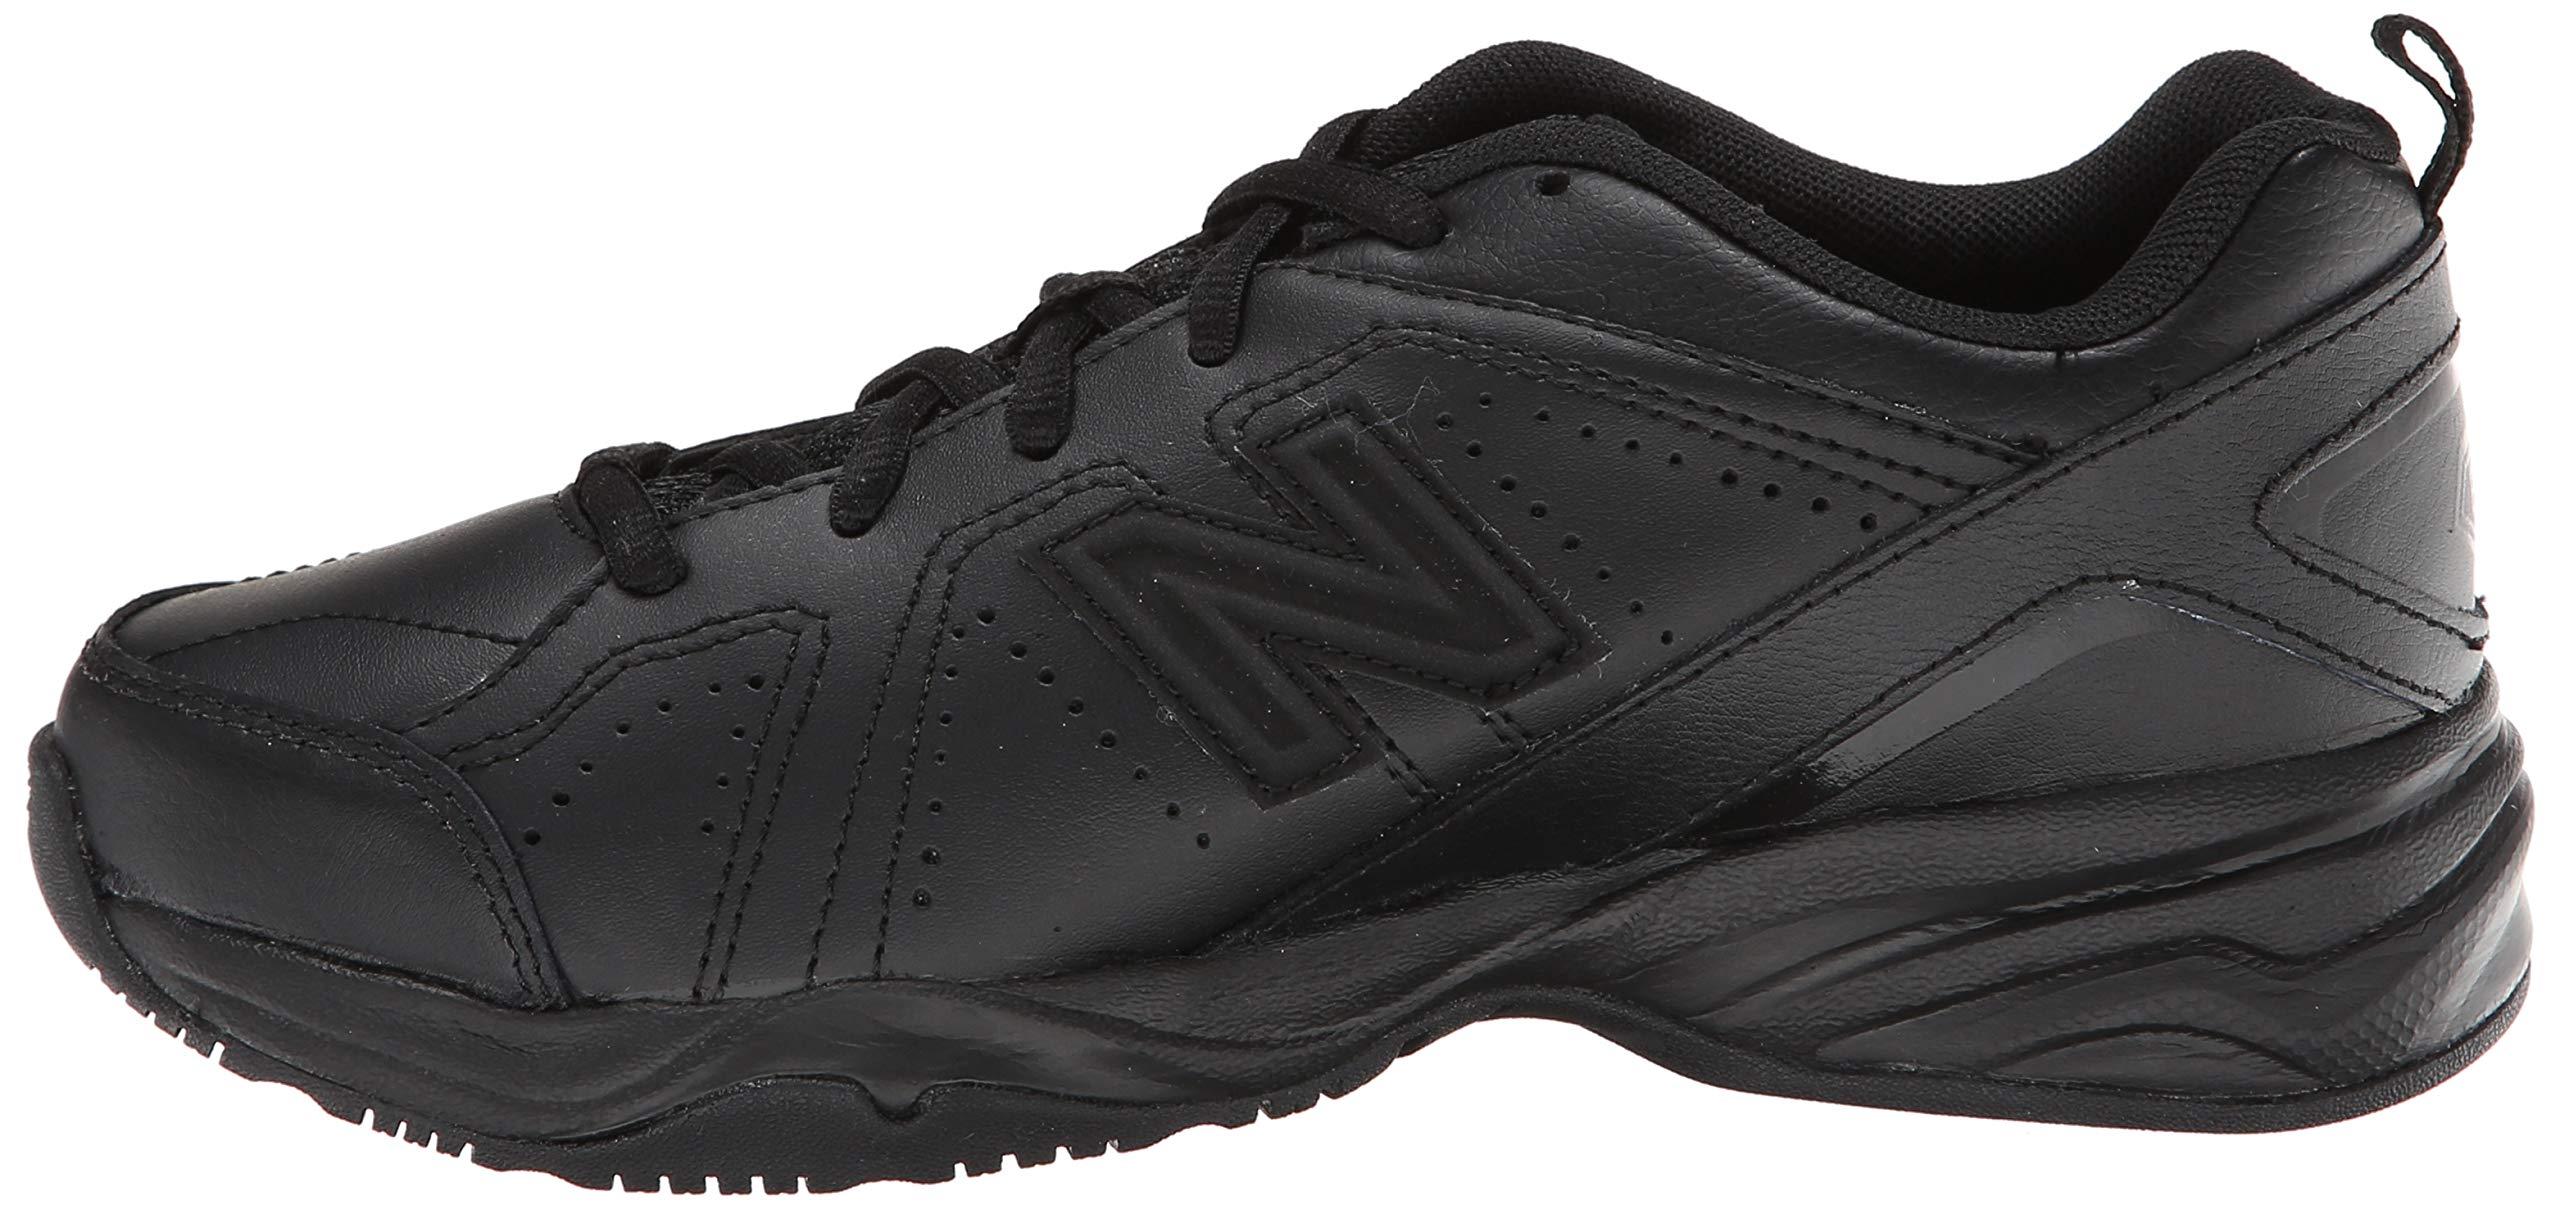 New Balance Boys KX624 Lace-Up Training Shoe ,Black,7 W US Big Kid by New Balance (Image #5)